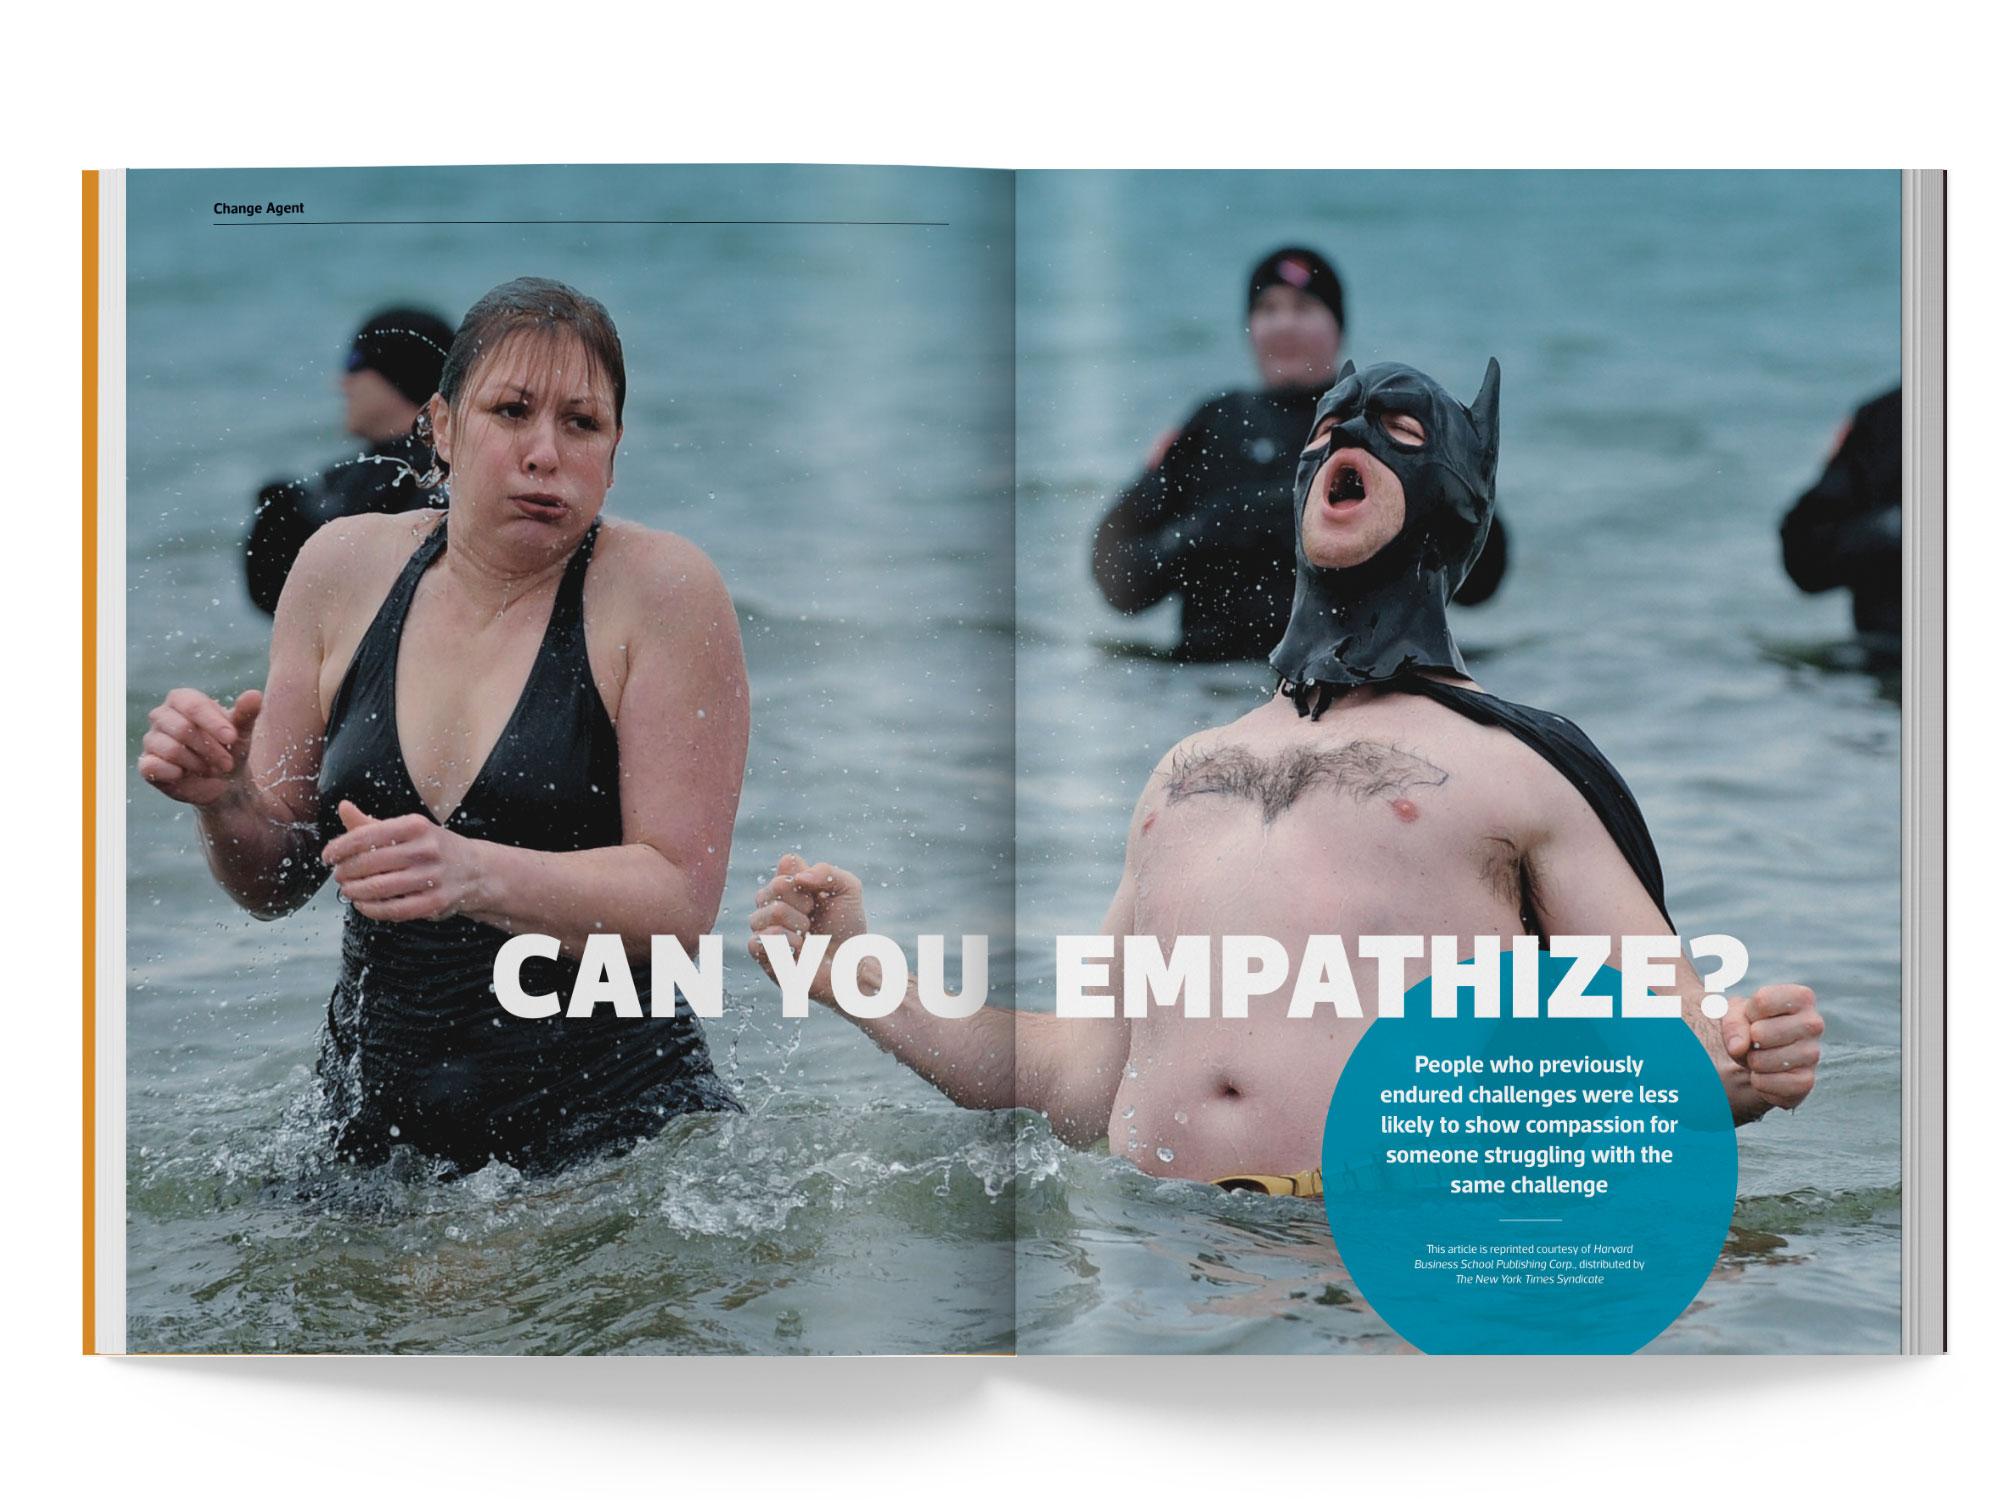 change-agent-empathize-layout_v02